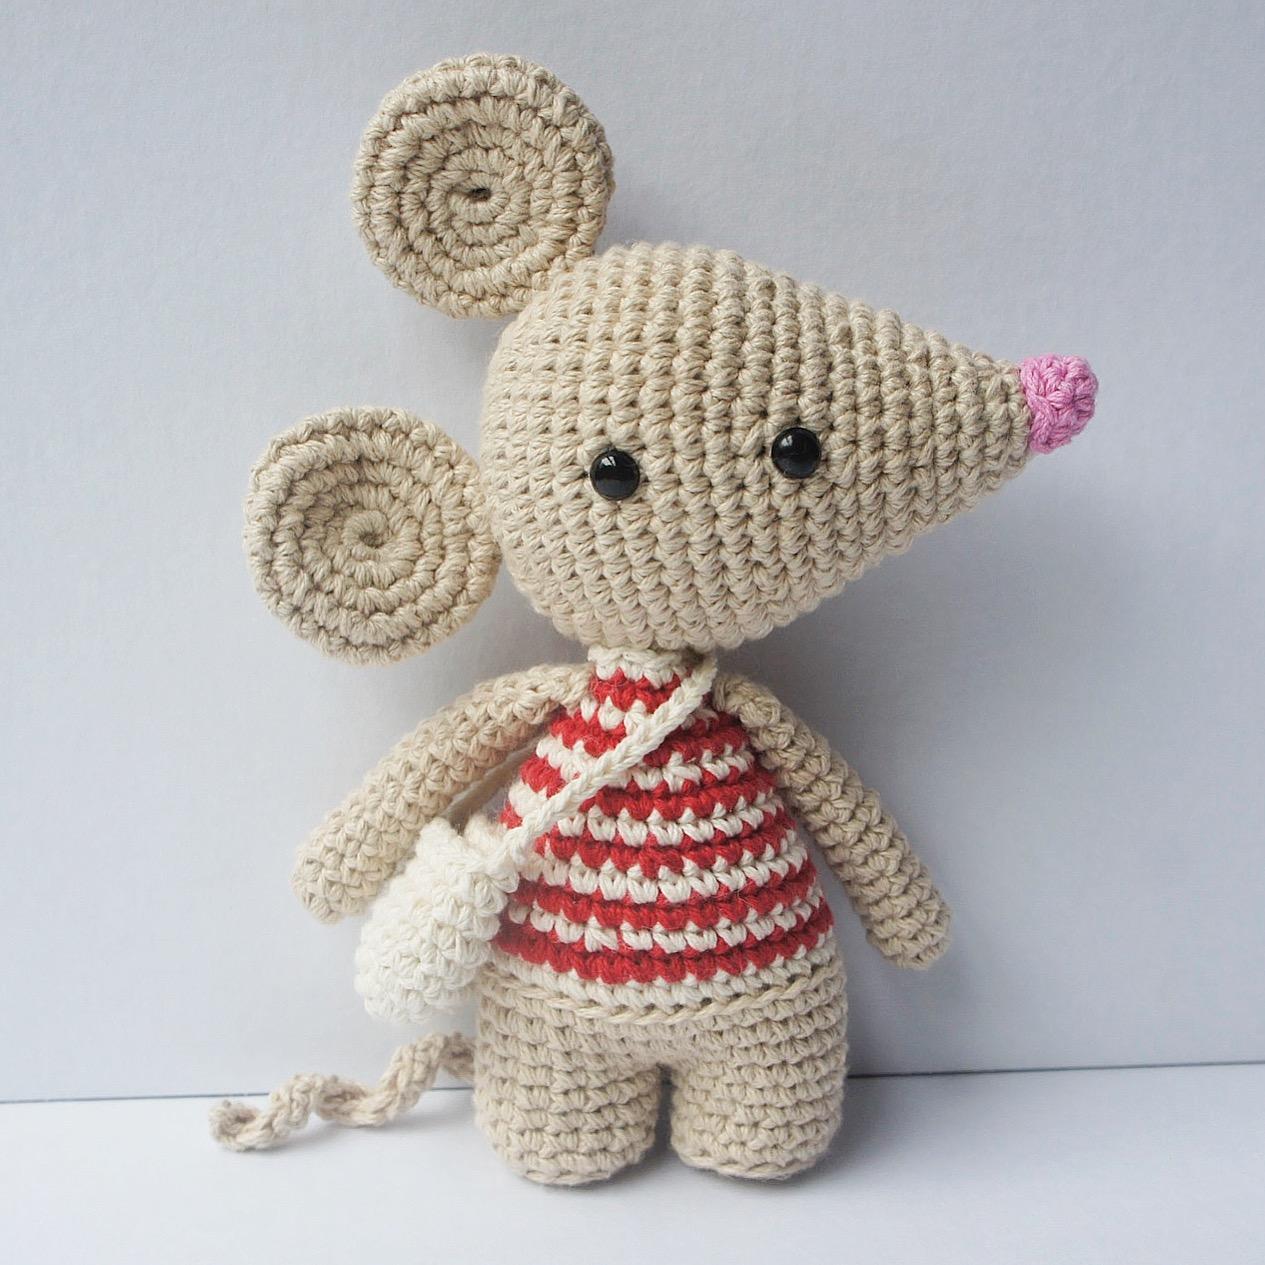 Ravelry: Crochet Amigurumi Tooth pattern by Lisa Eberhart | 1265x1265